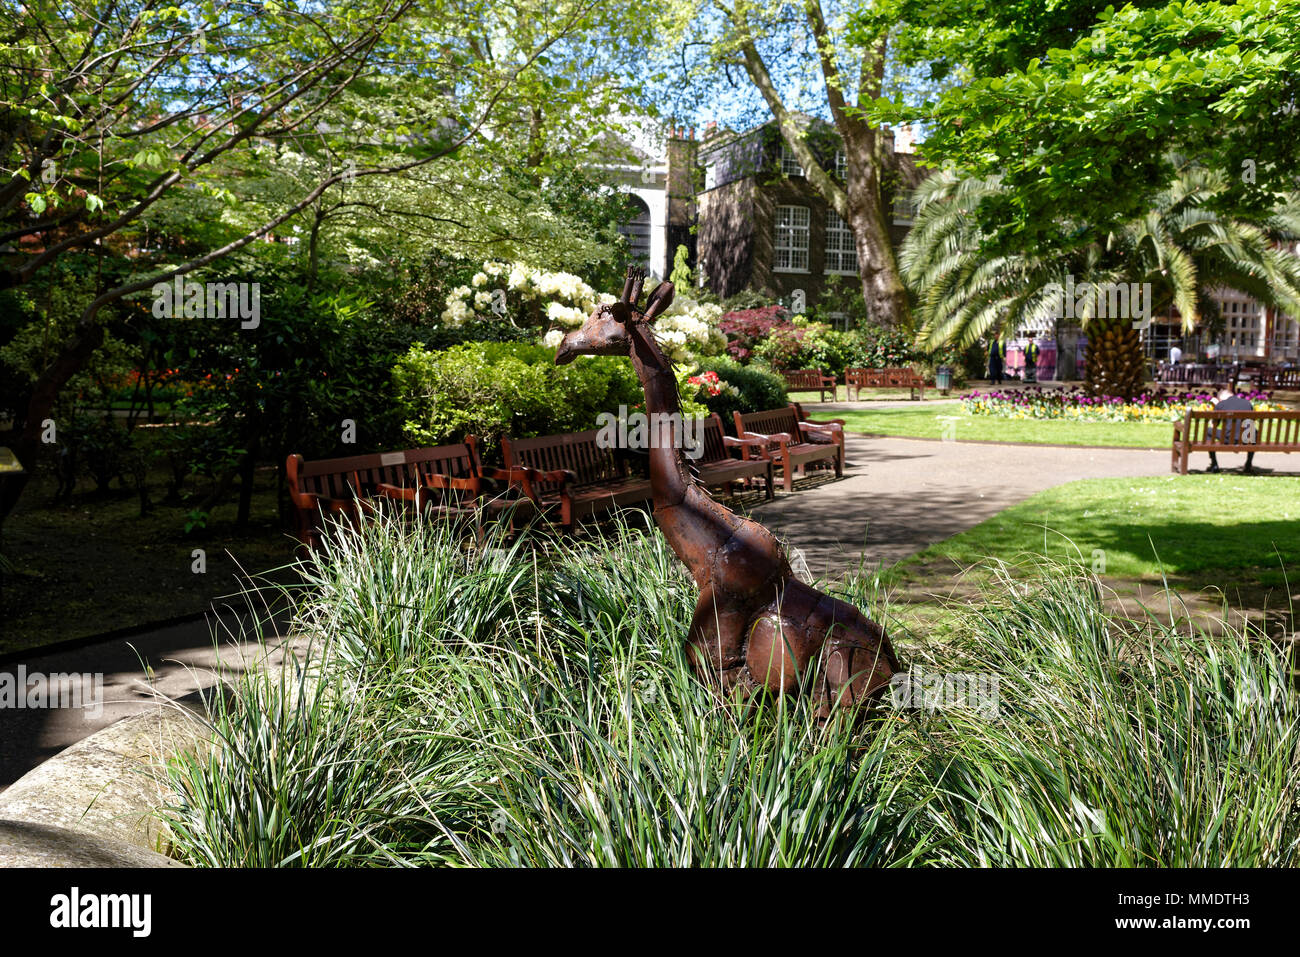 Metal Giraffe statue, modern art, in Mount Street Gardens, Mayfair, London, England - Stock Image